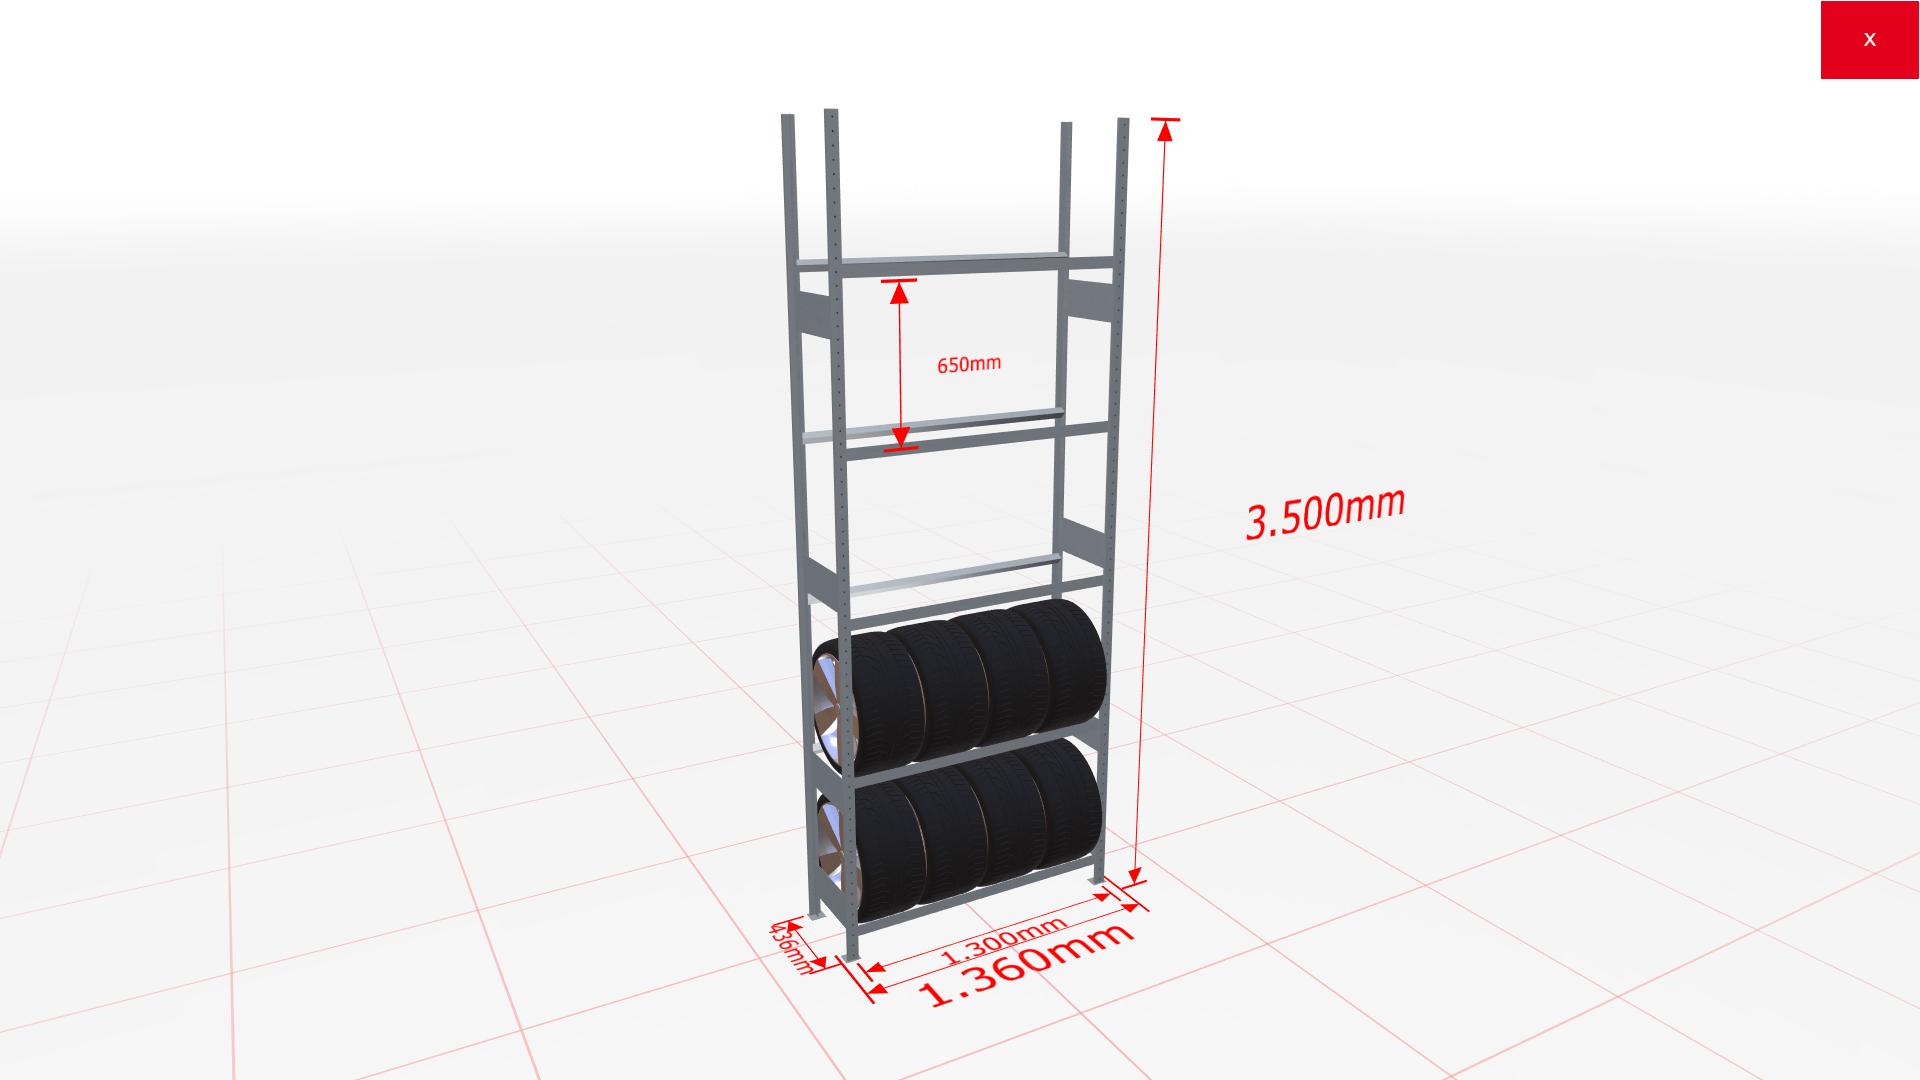 Räderregal Grundregal SCHULTE Lagertechnik 3500x1300x400 mm – 5 Ebenen á 1300 mm, verzinkt